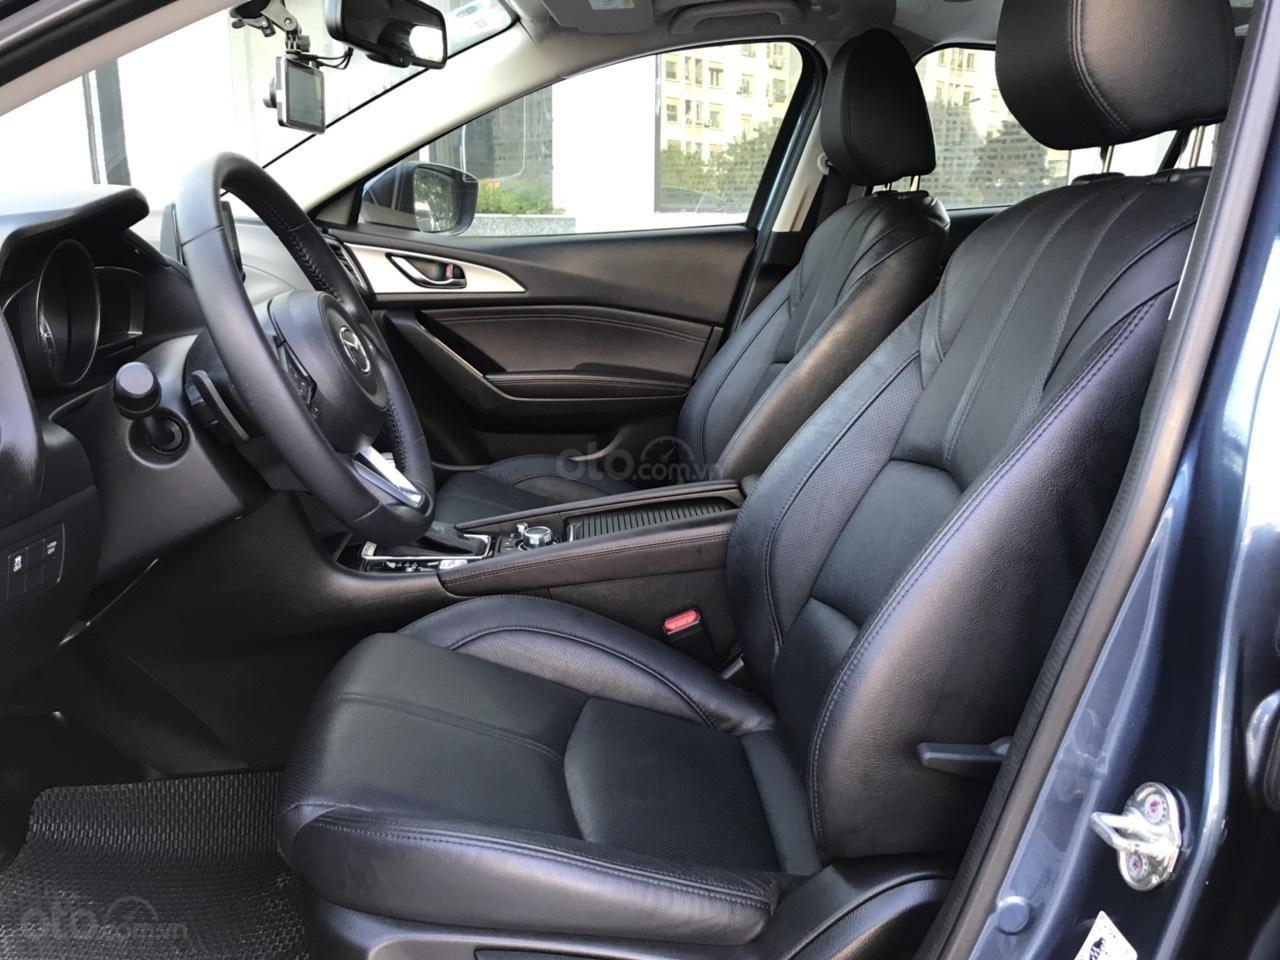 ManyCar bán Mazda 3 sedan model 2018, xe đẹp đi ít (5)